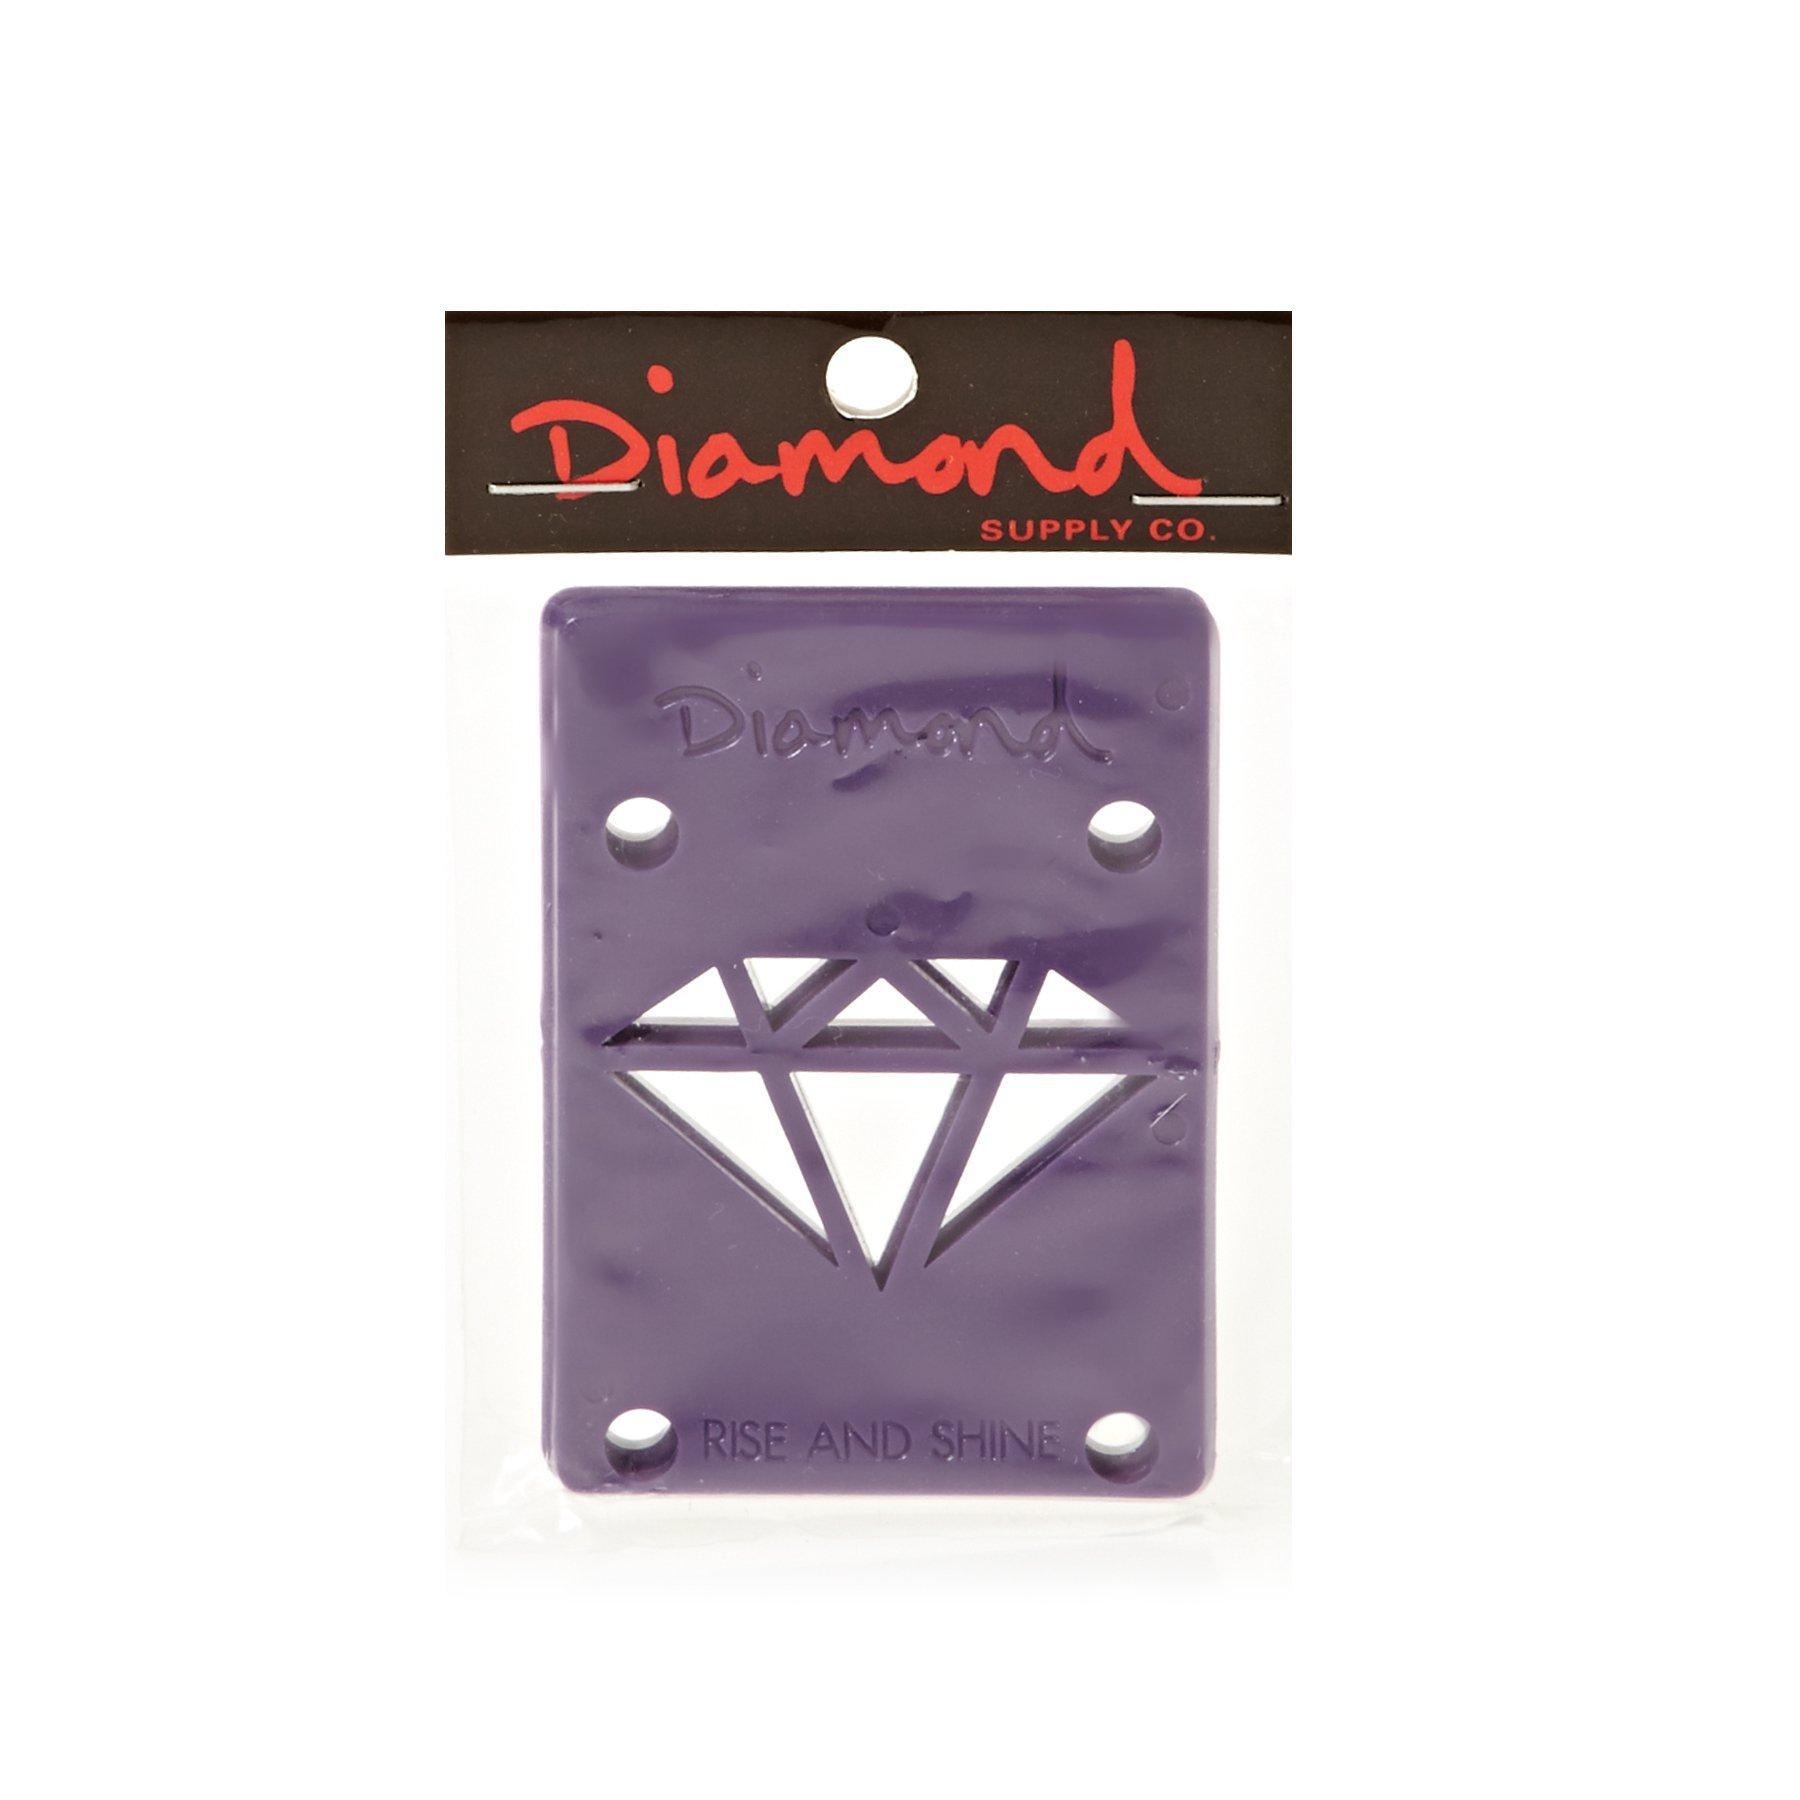 Diamond Supply Co Rise And Shine Skateboard Risers One Size Purple